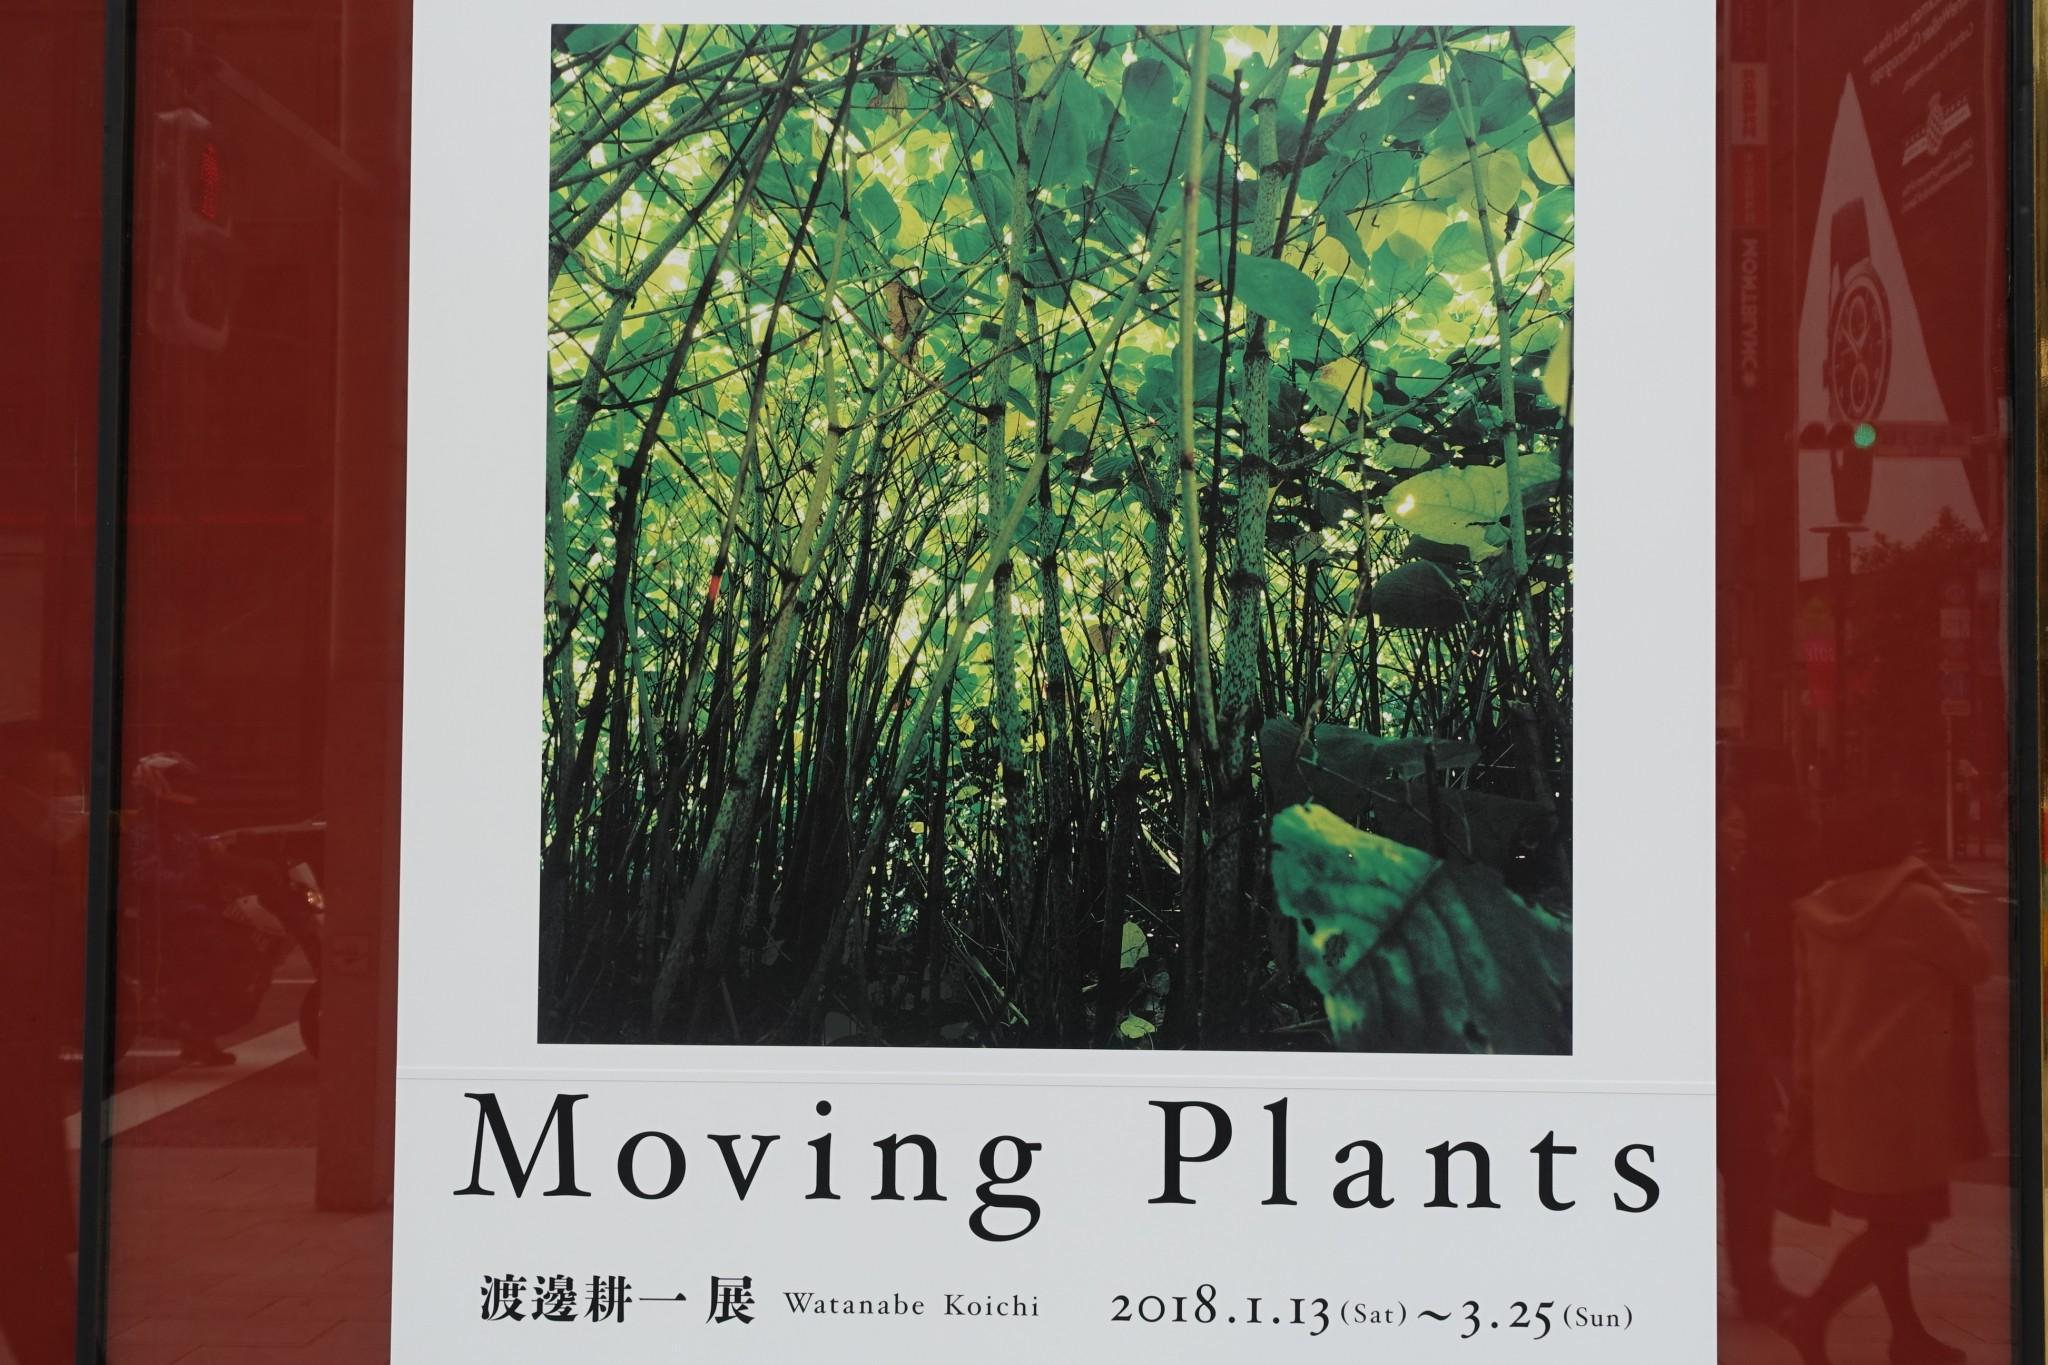 Moving Plants 渡邊 耕一展